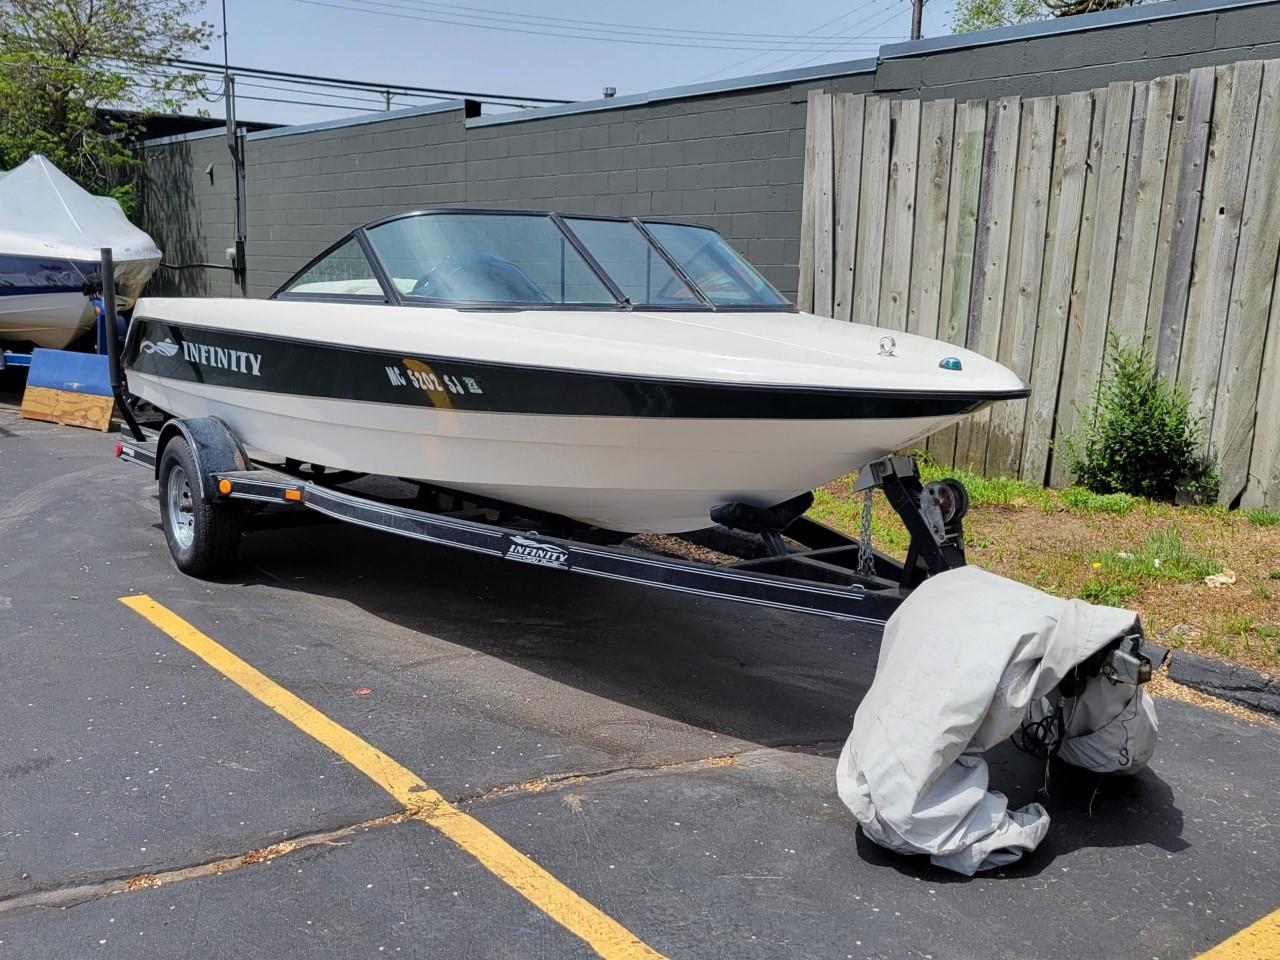 2001 Infinity ZX-1 21' Ski Boat